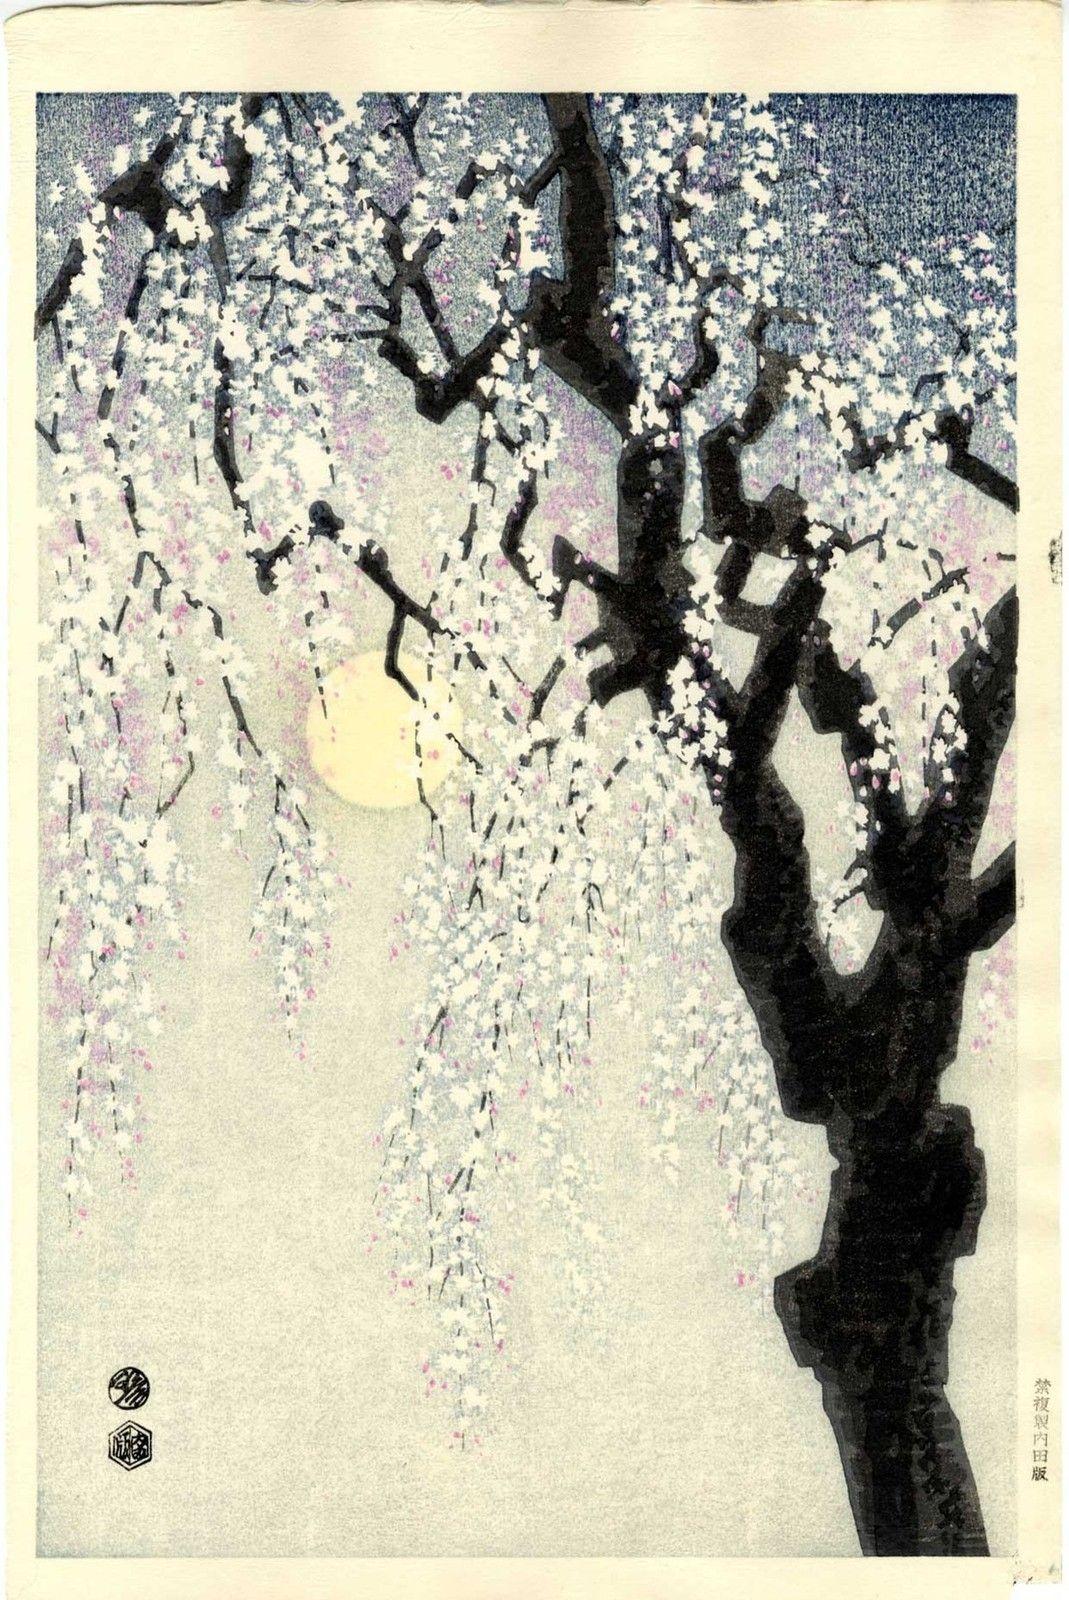 Kotozuka Eiichi Japanese Woodblock Print Drooping Cherry Blossoms 1940s Japanese Woodblock Printing Woodblock Print Japanese Blossom